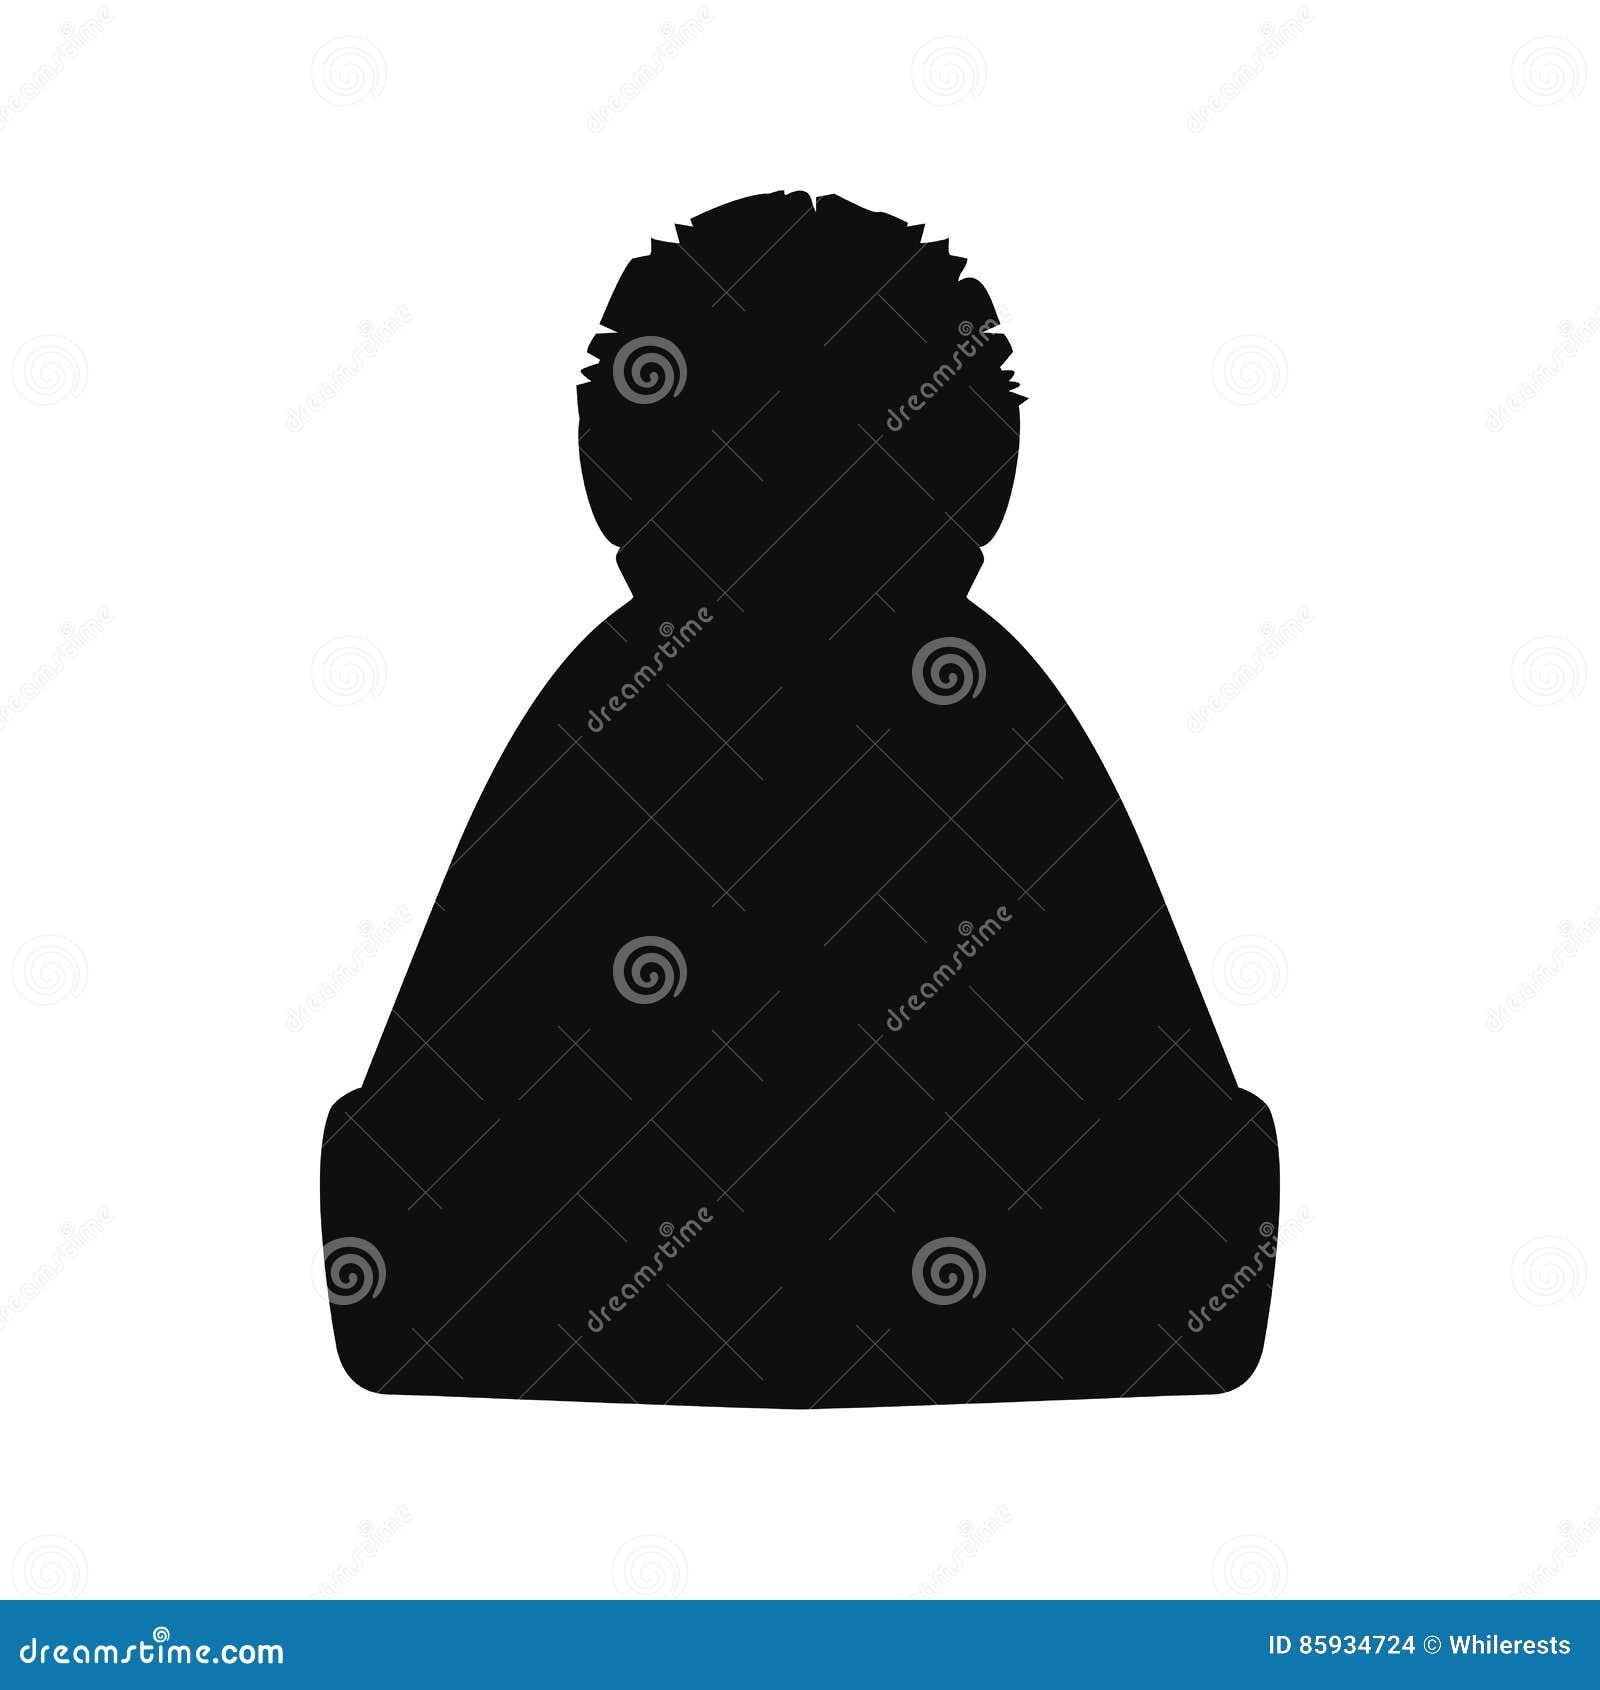 dc4d6229318 Winter hat silhouette. Top black hat on white. Vector illustration eps10.  More similar stock illustrations